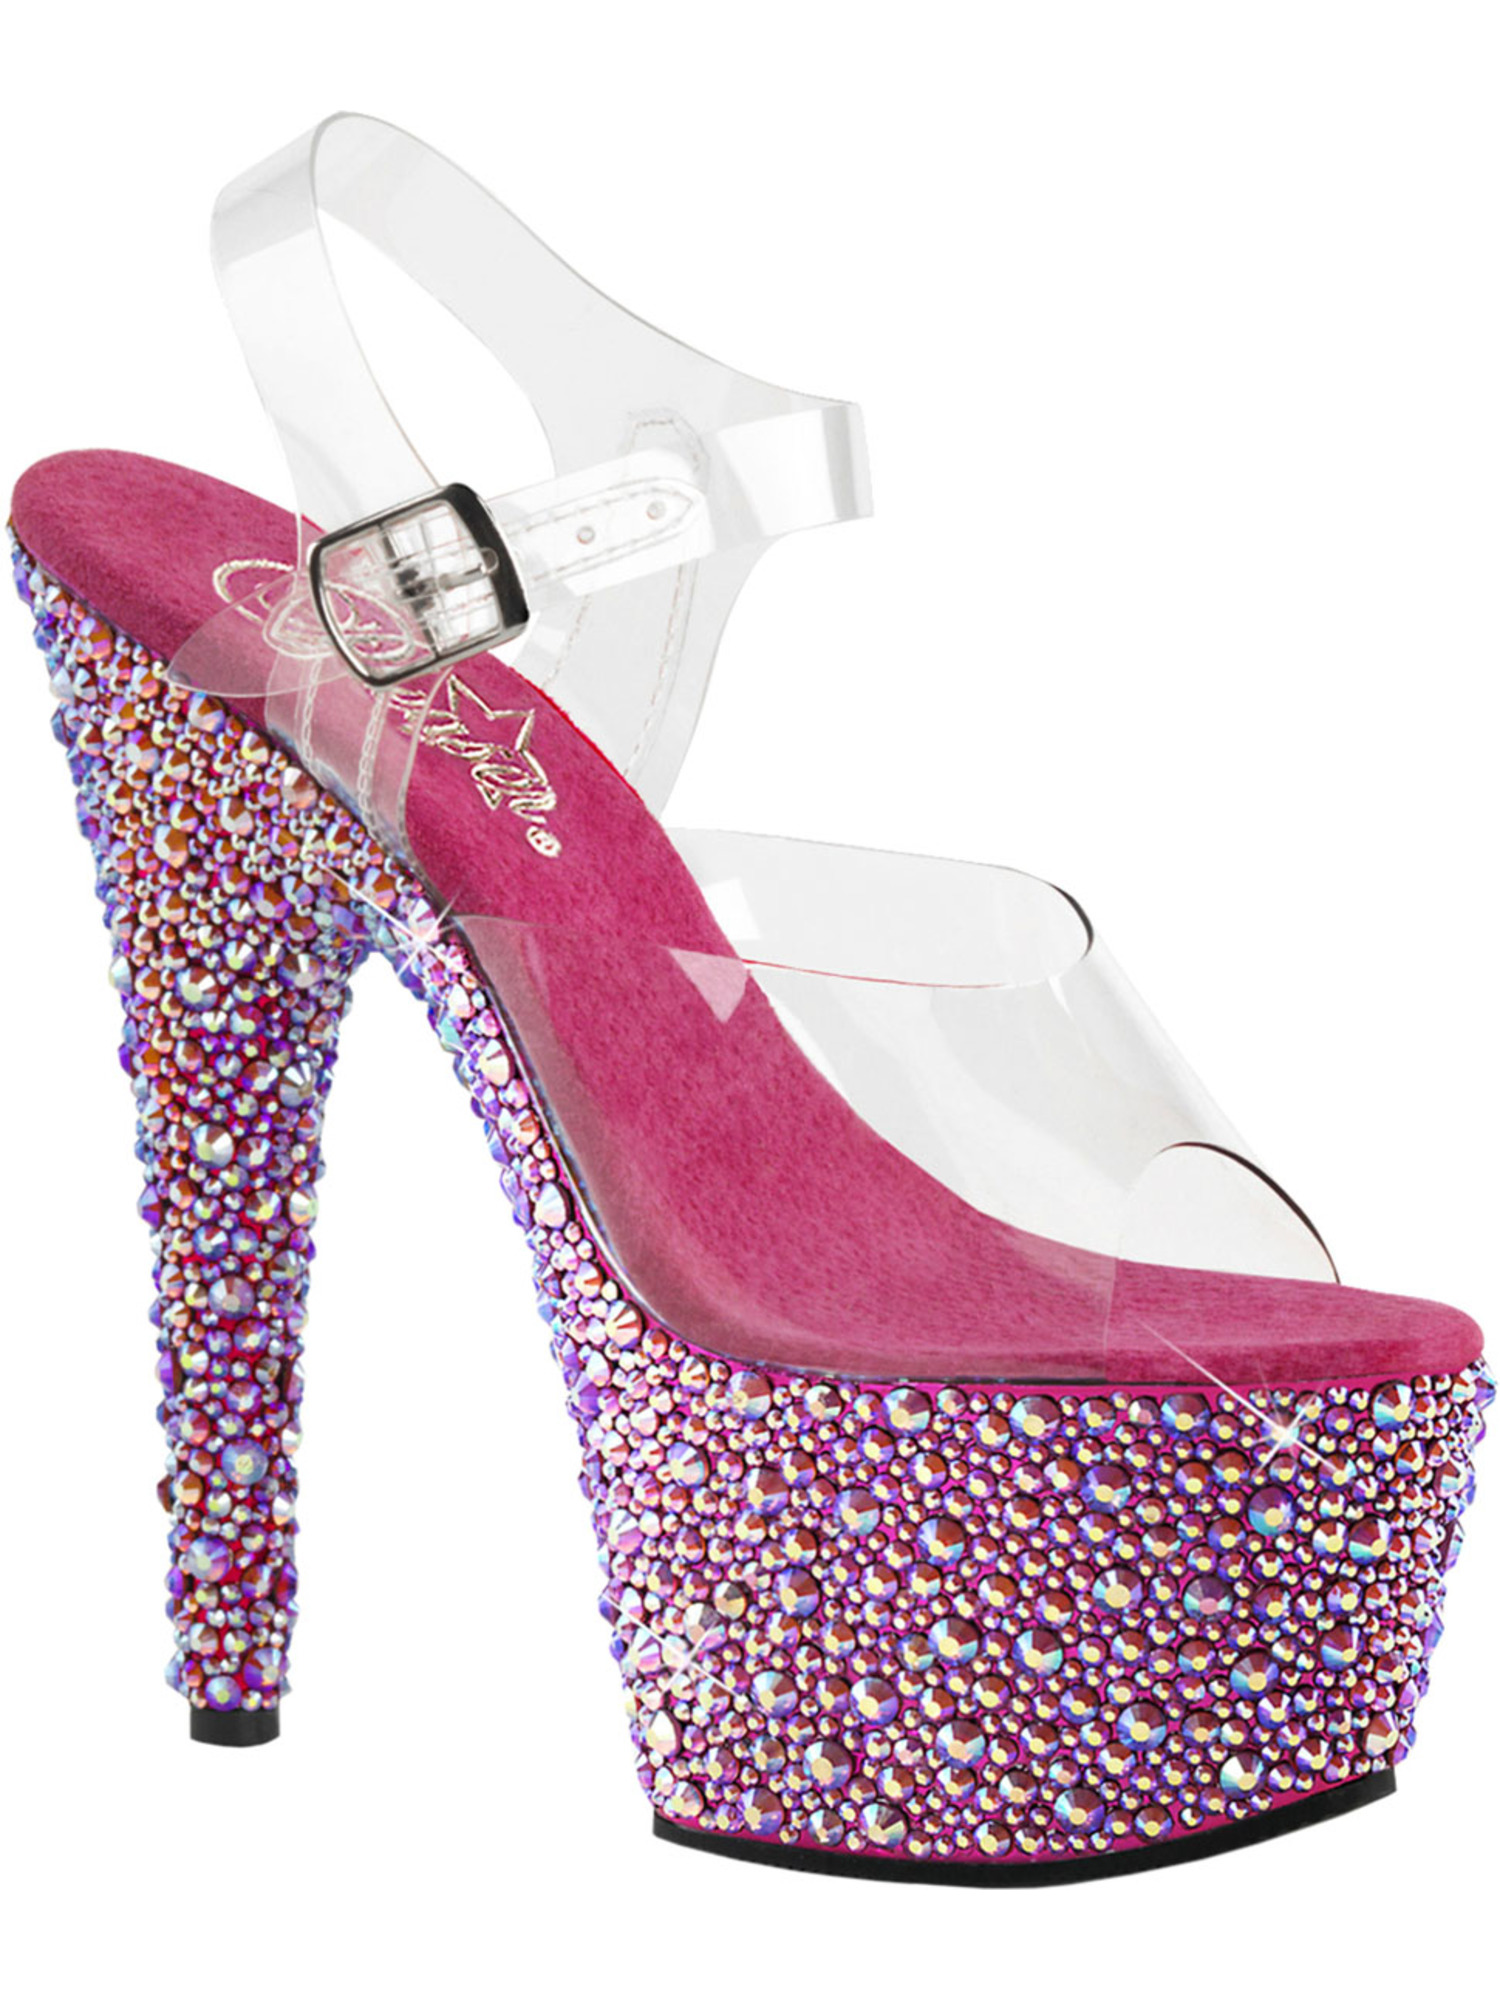 Womens Pink High Heels Platform Sandals Open Toe Shoes Rhinestones 7 Inch Heels